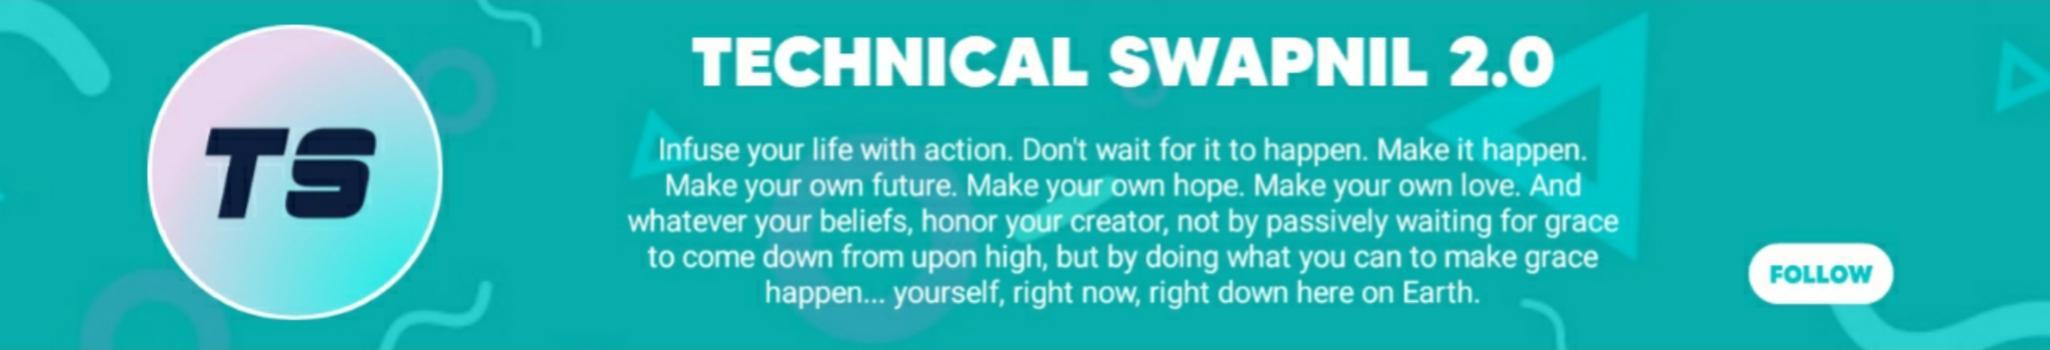 Technical Swapnil 2.0